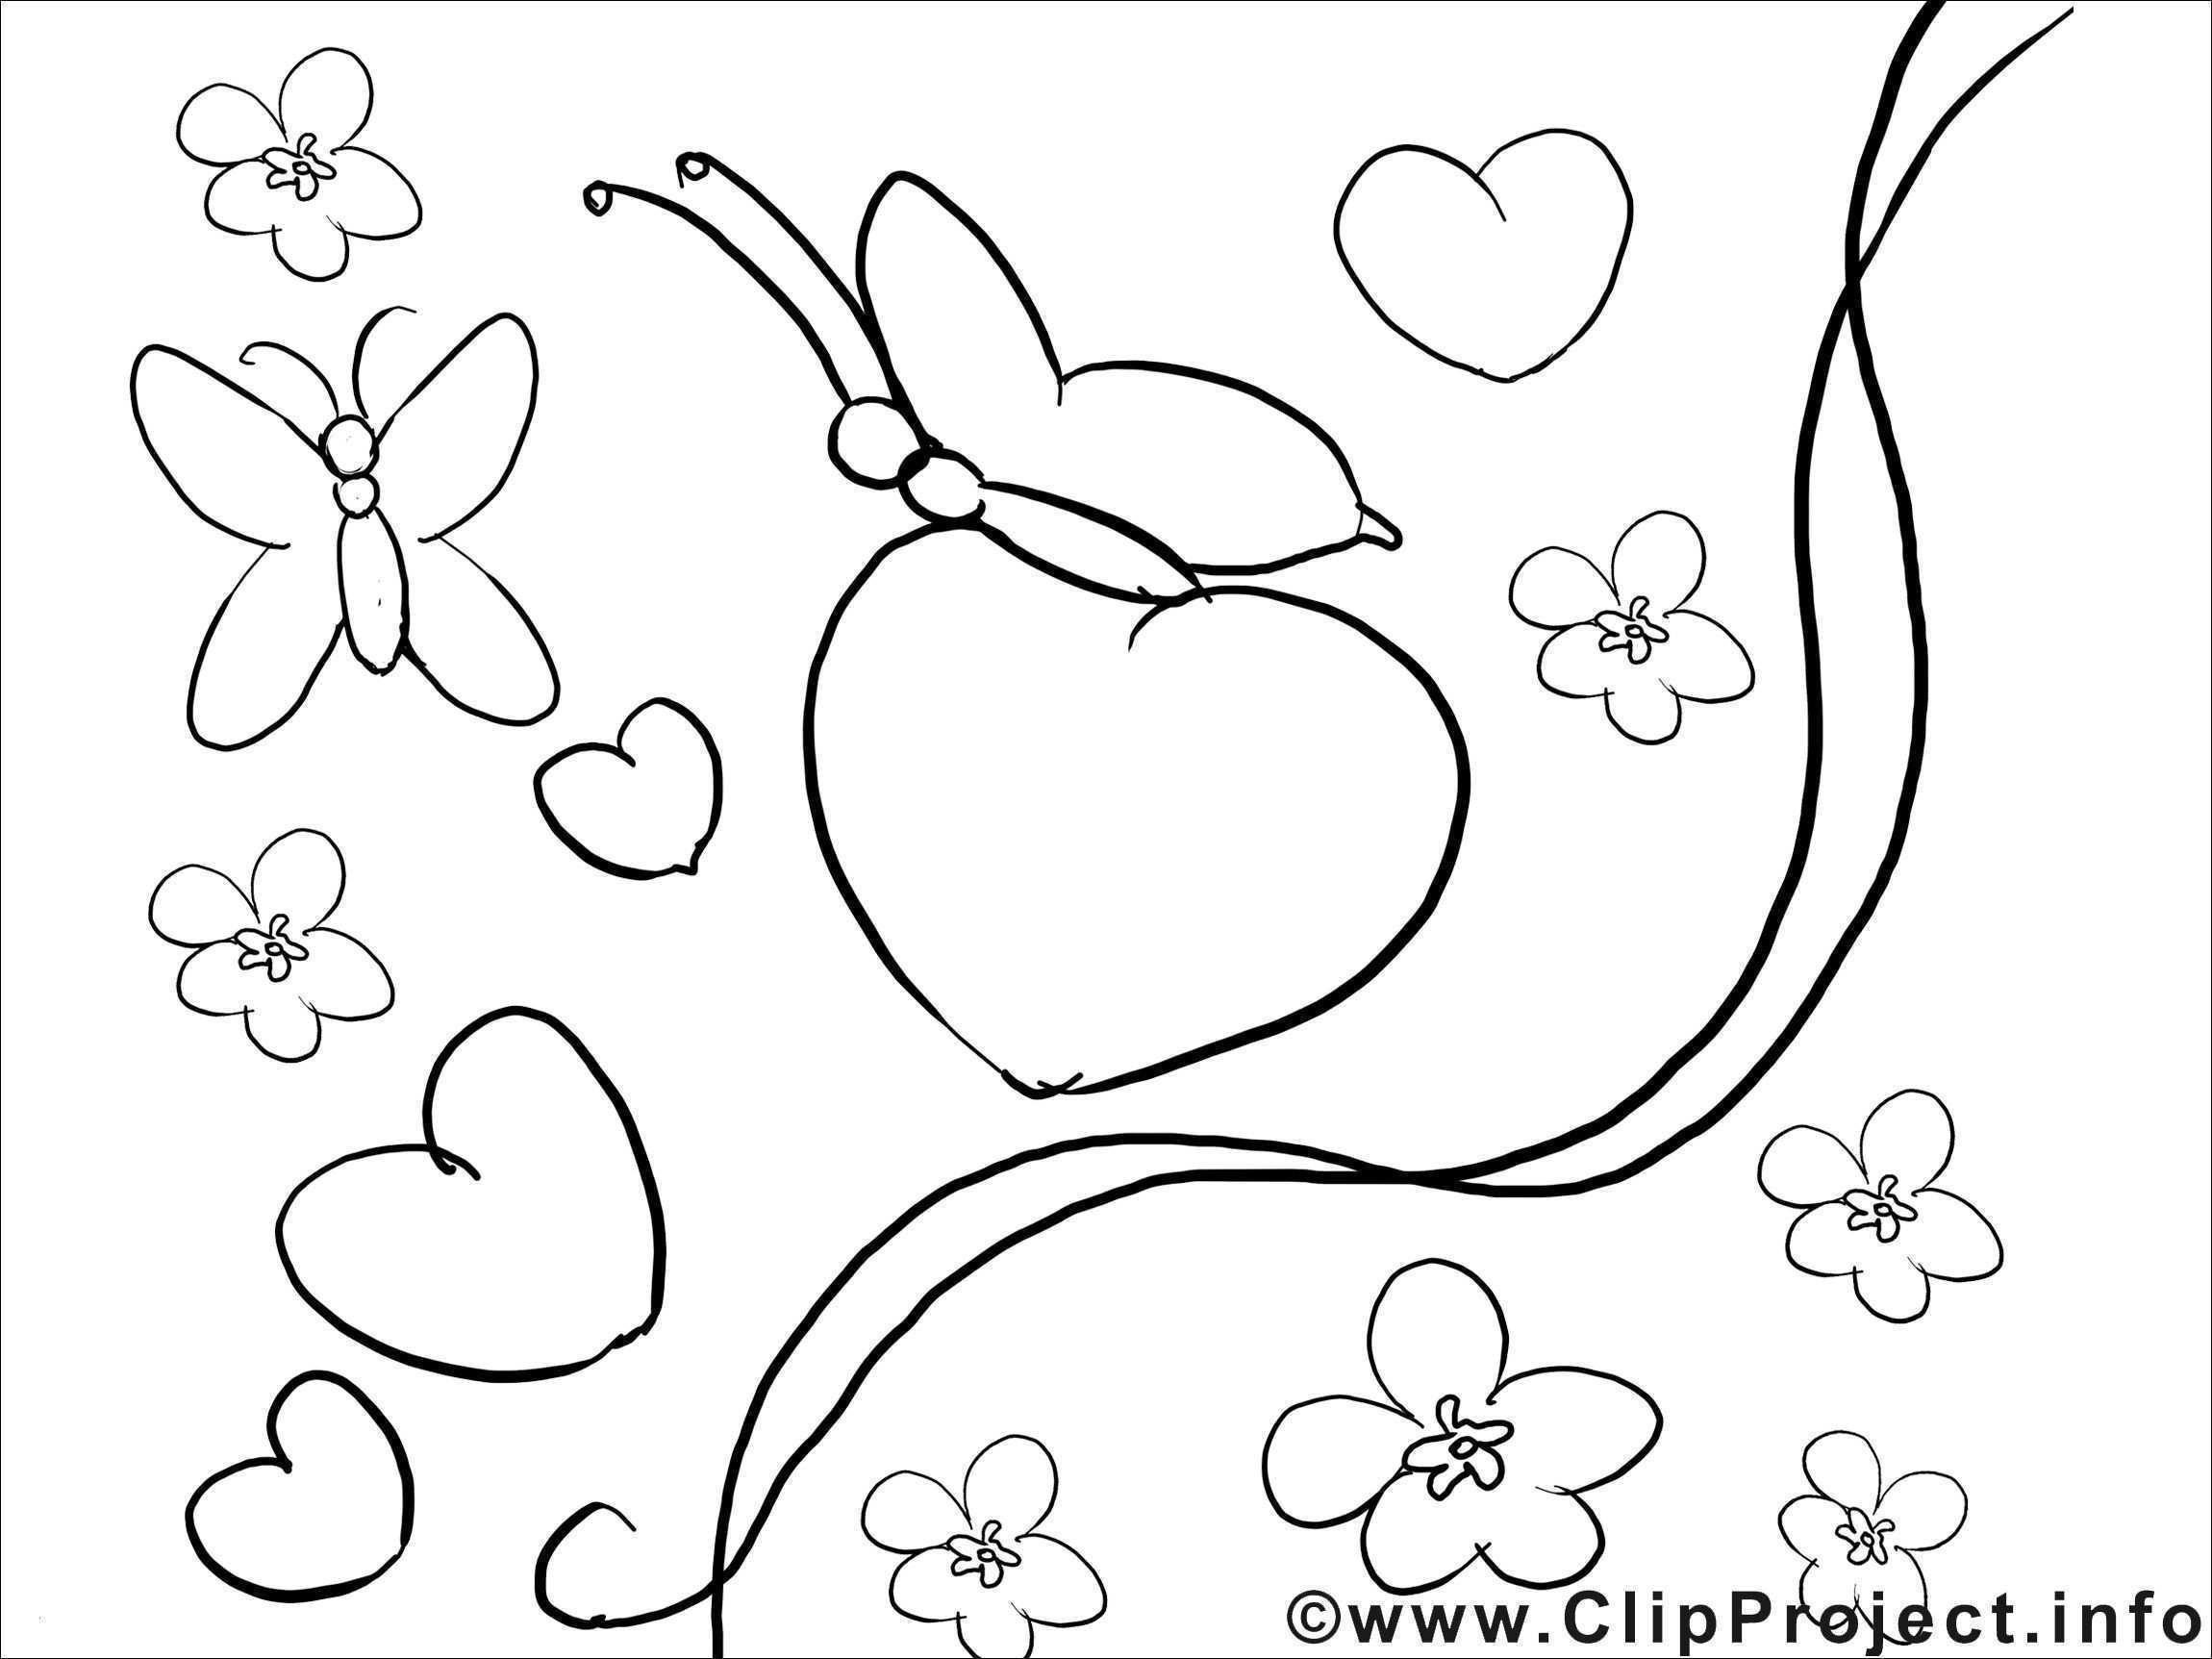 Ausmalbilder Bugs Bunny Neu Malvorlagen Bugs Bunny Aufnahme Bugs Bunny Wallpapers for Desktop Fotografieren